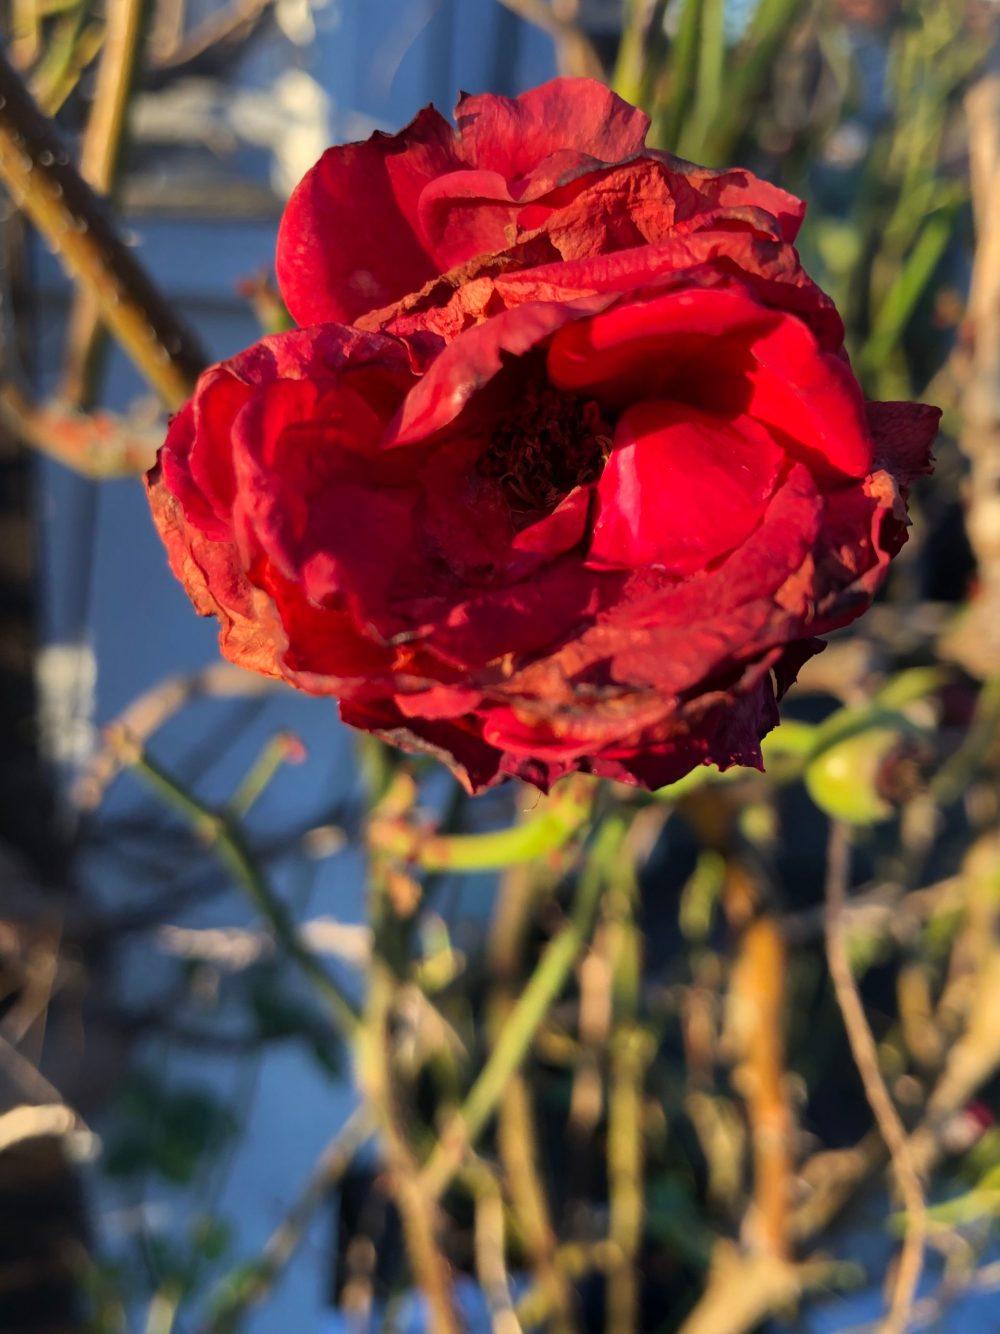 Etwas überreife rote Rose